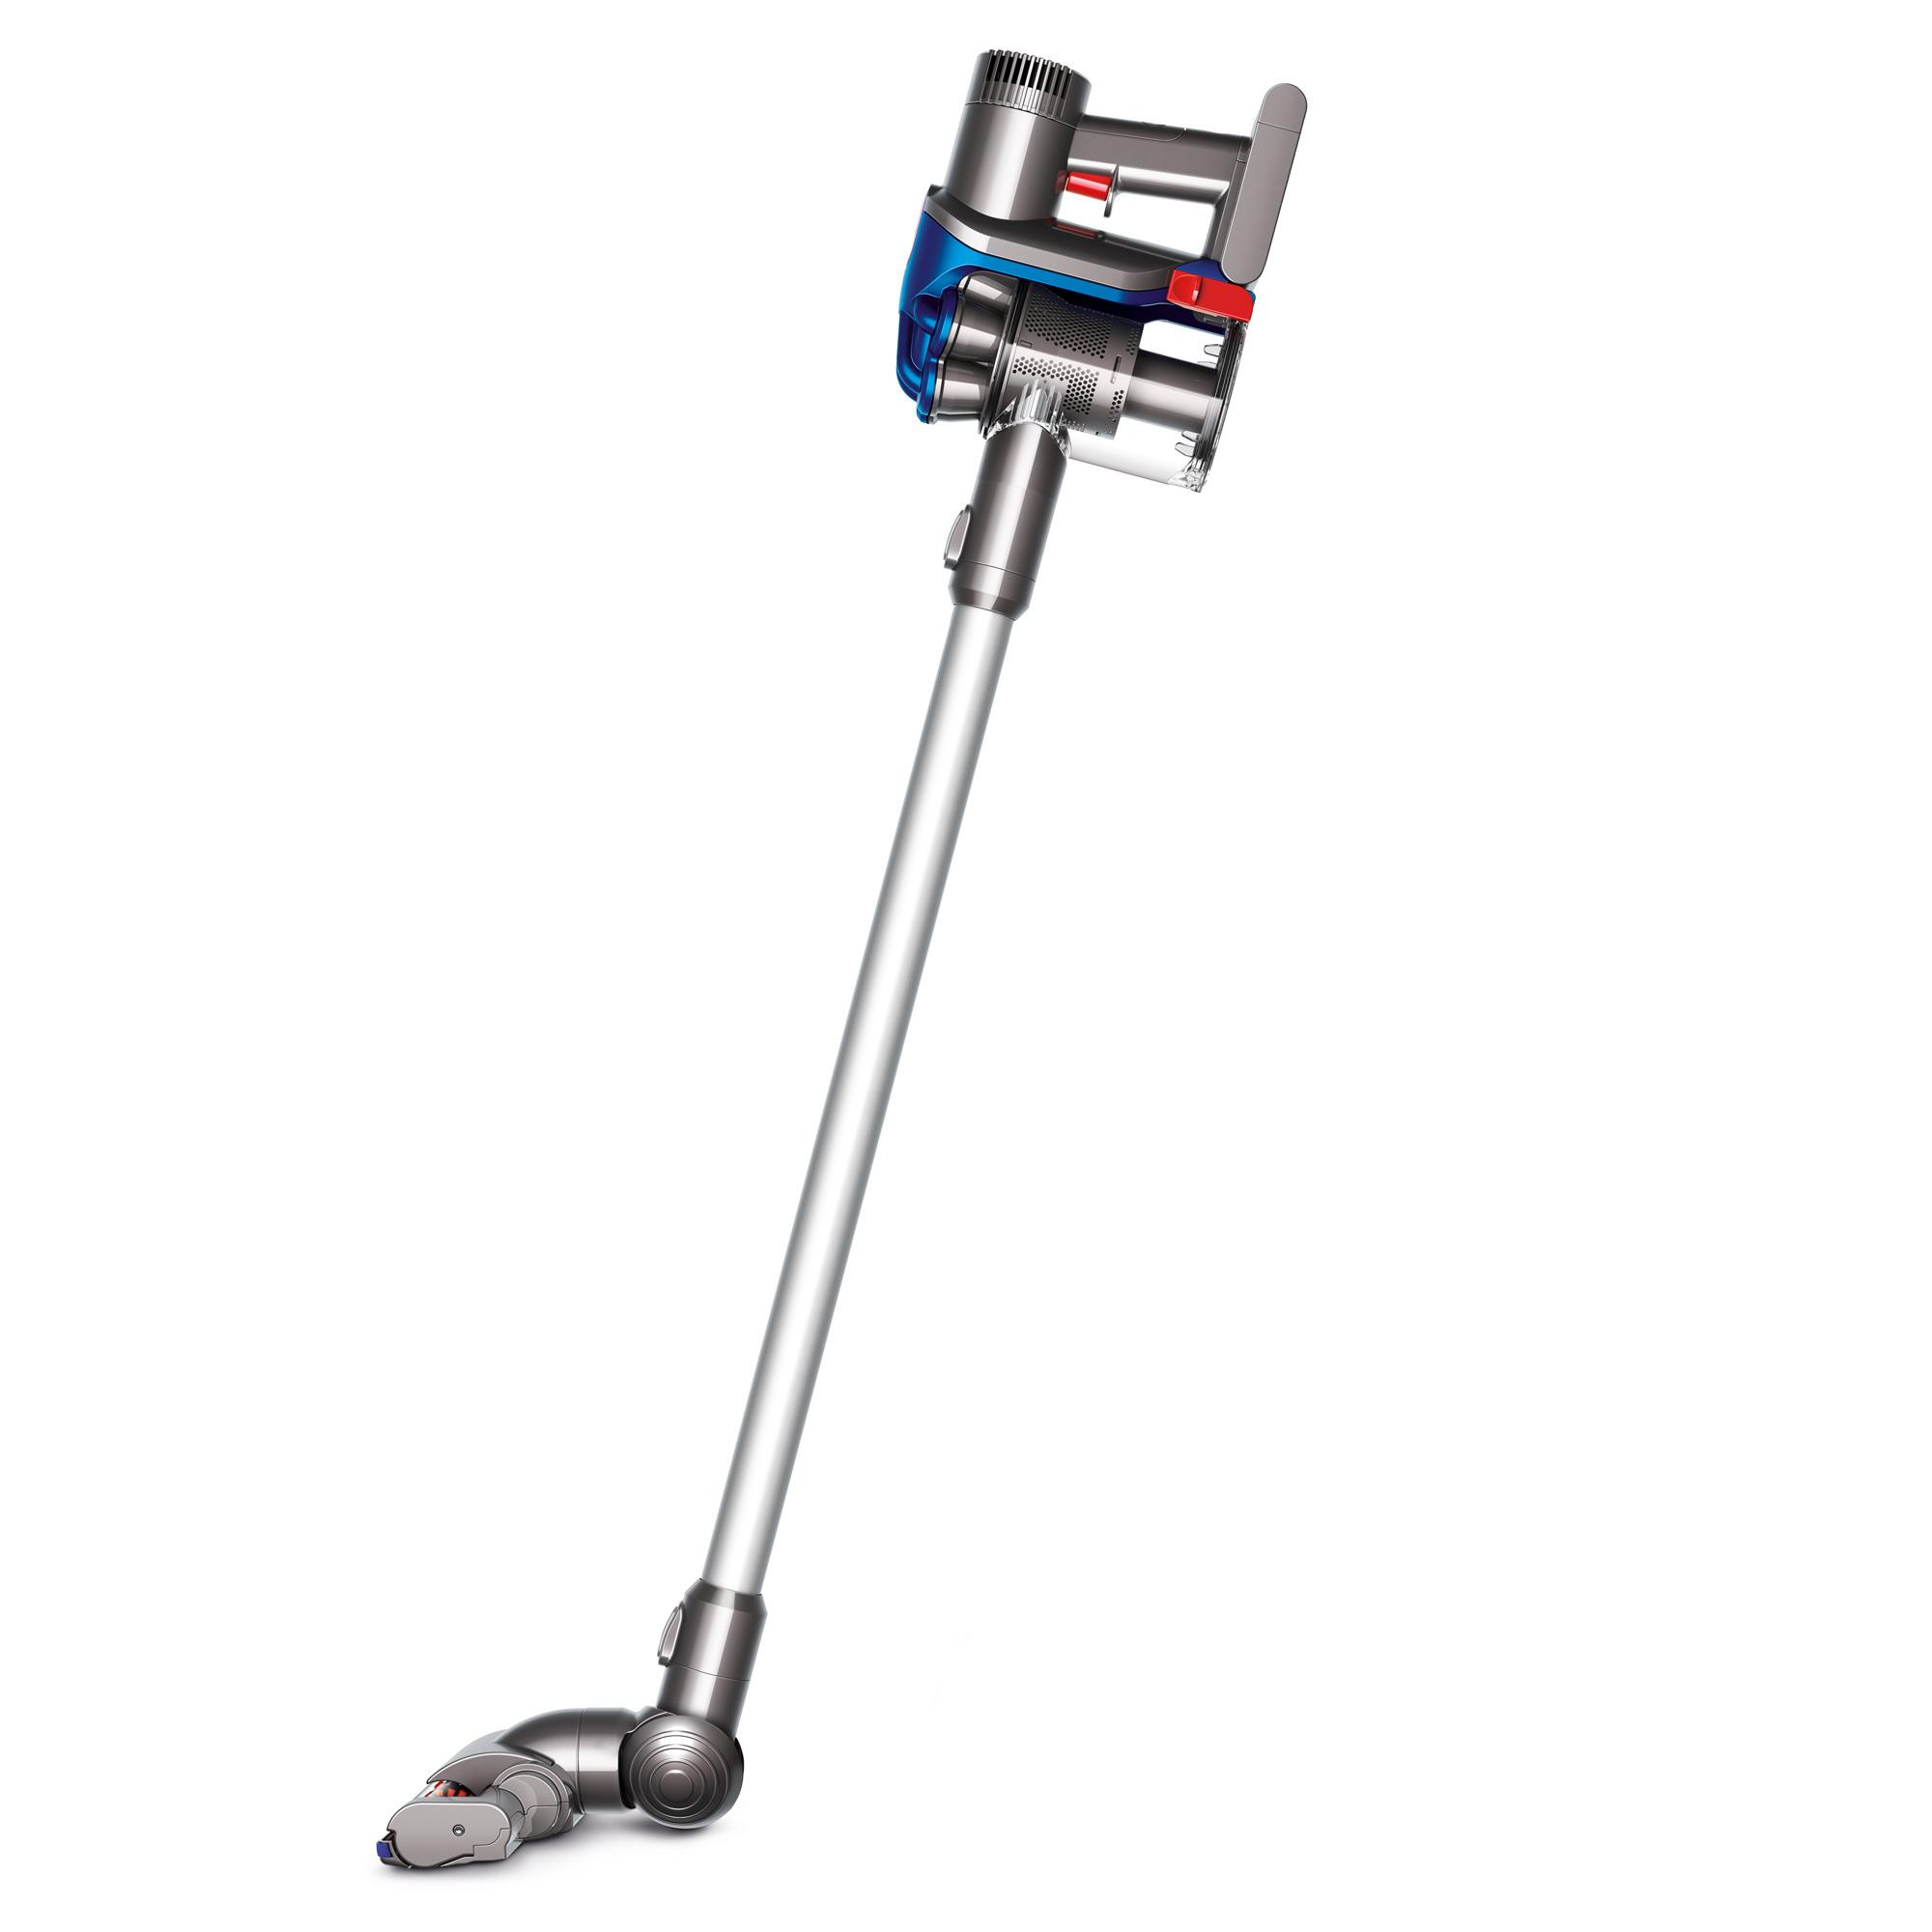 cheapest dyson dc34 handheld vacuum singapore pricelist home - Dyson Handheld Vacuum